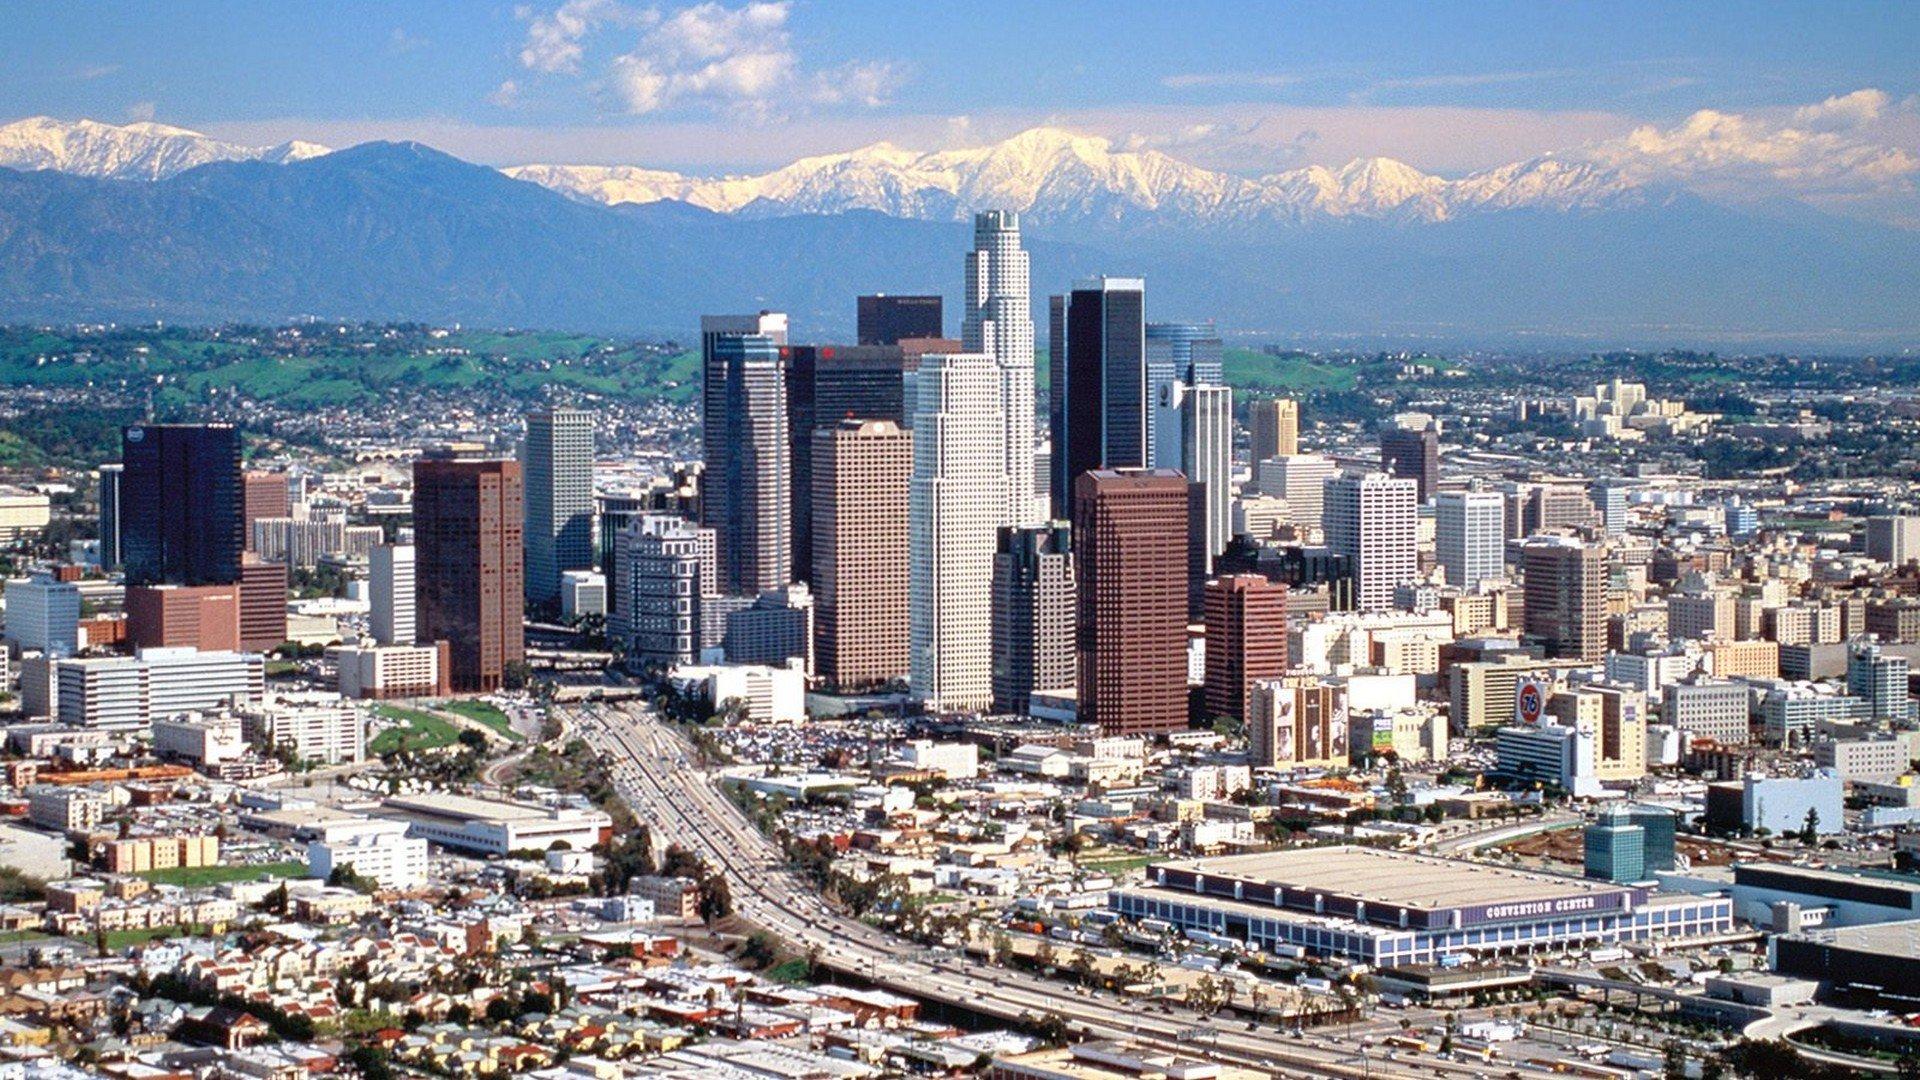 41+ Los Angeles HD Wallpapers 1080p on WallpaperSafari